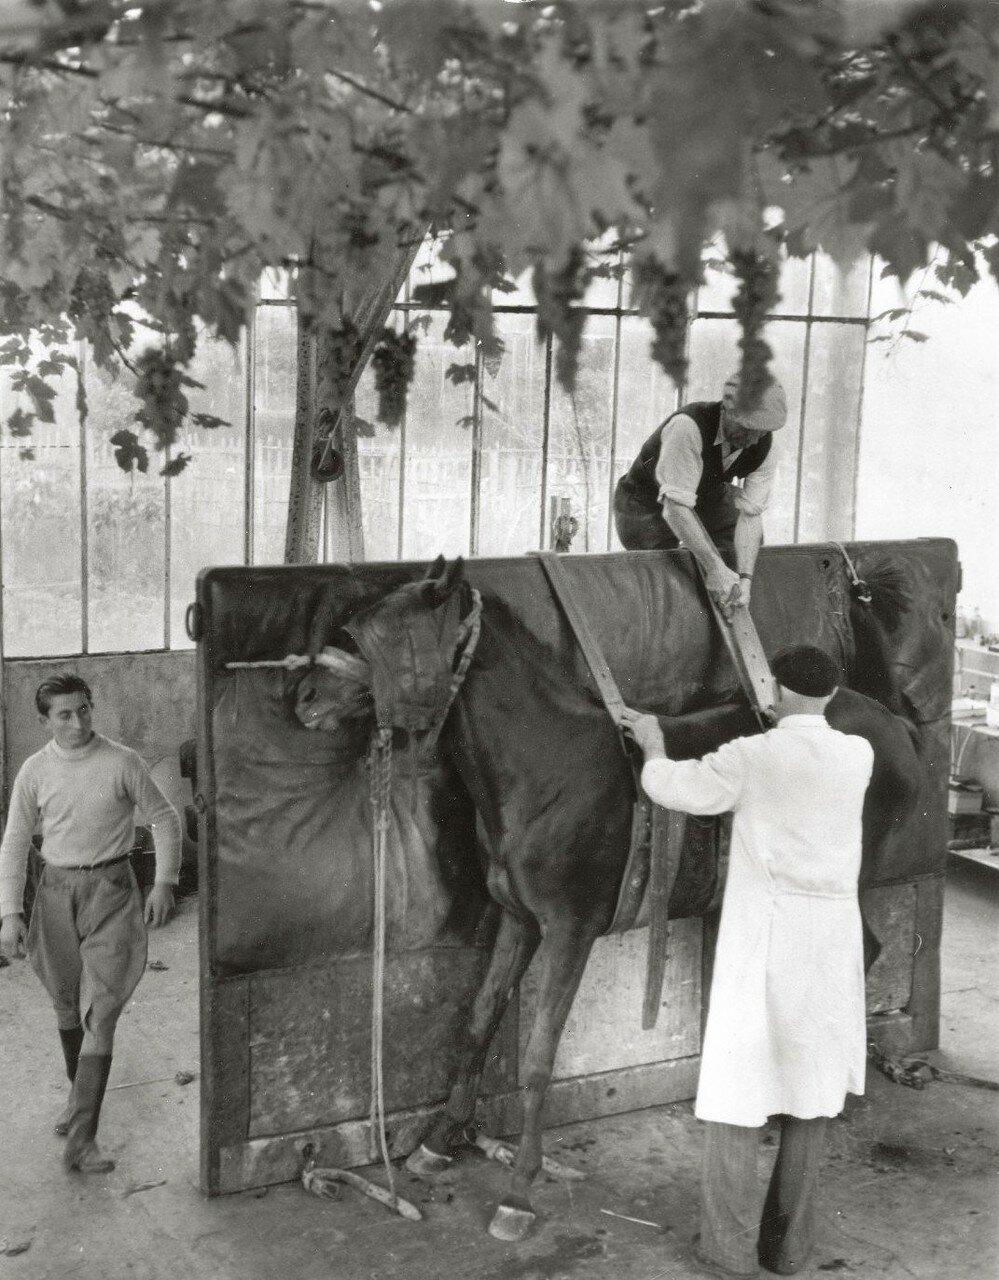 1954. Доктор Спитц, ветеринар